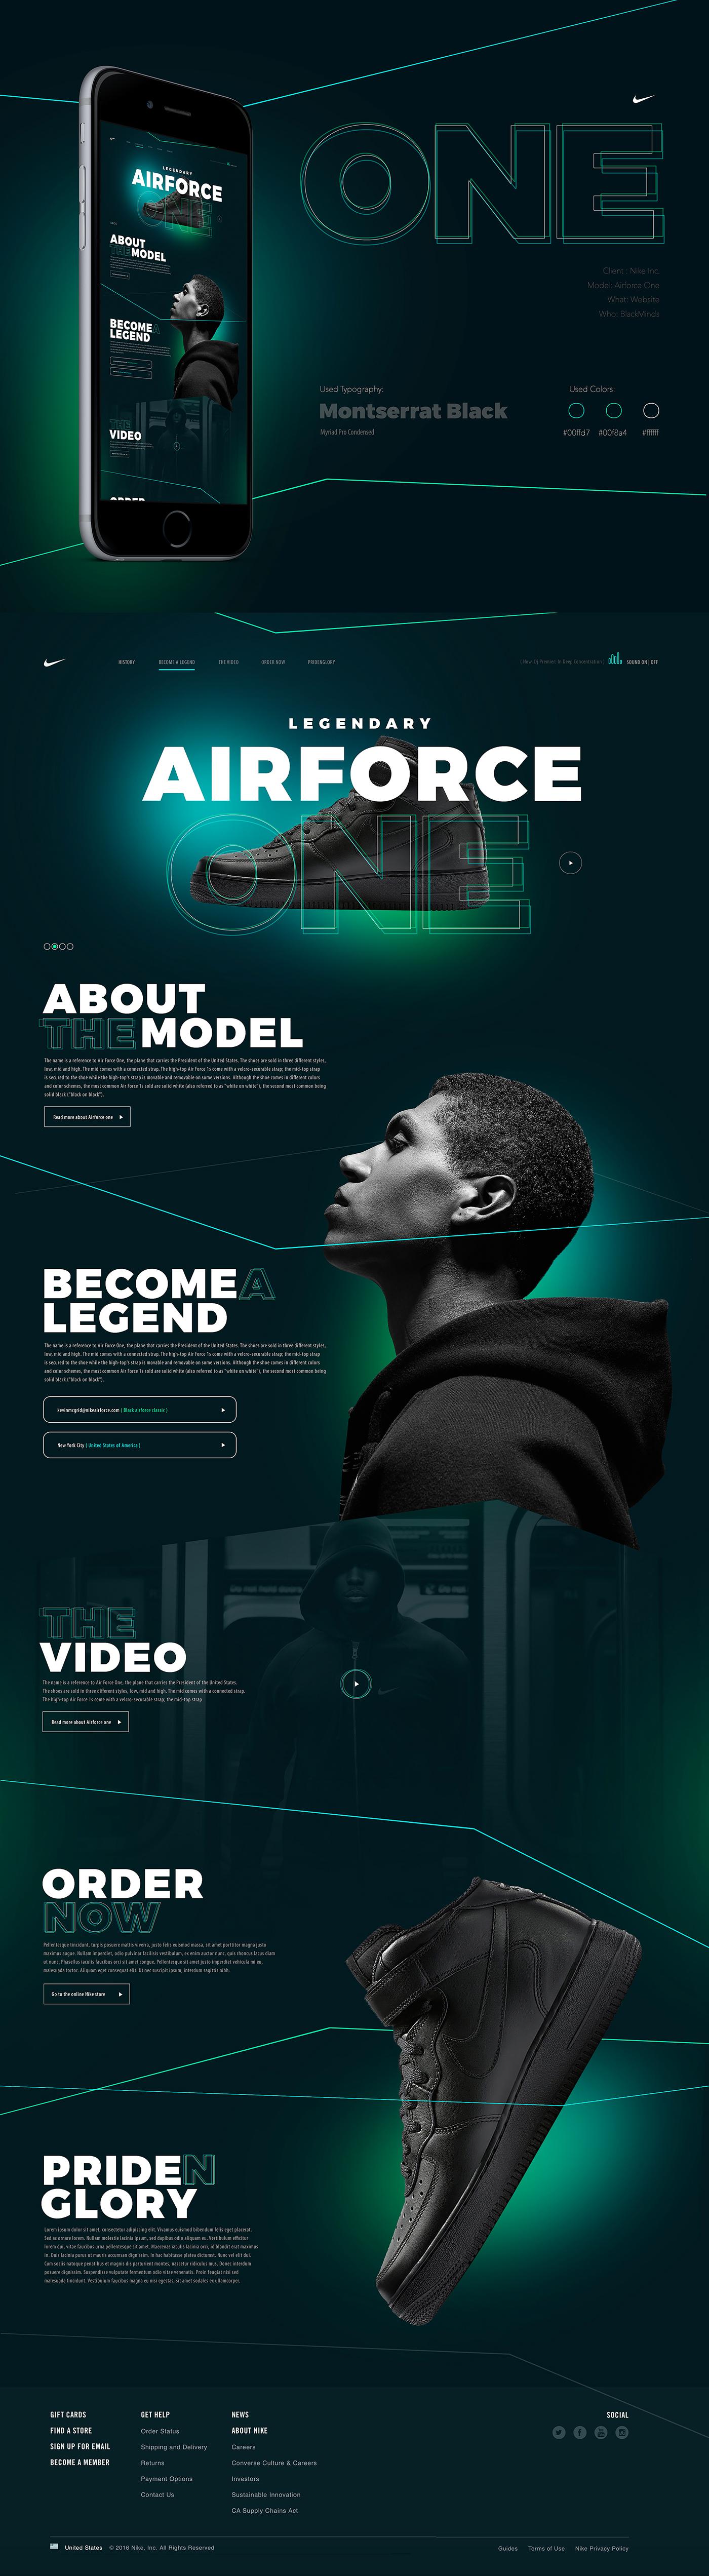 Web Layout Nike design poland dark minimal Dawidbogucki abstract direction